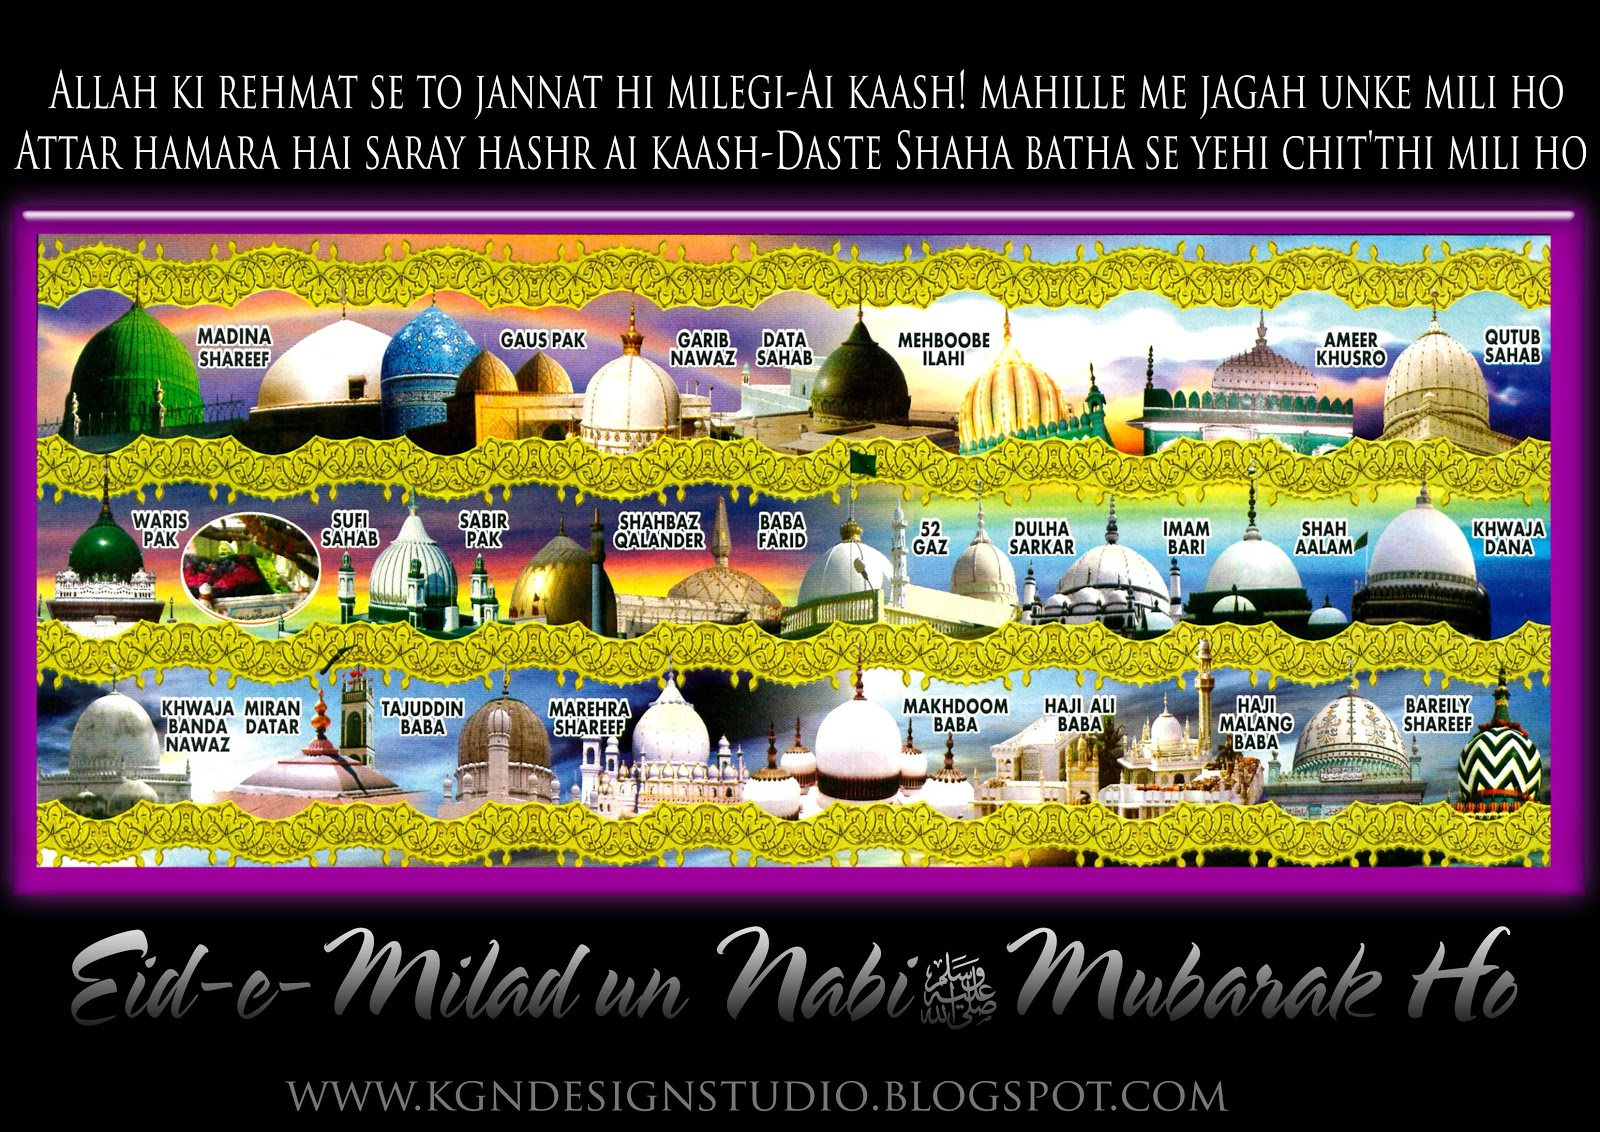 http://1.bp.blogspot.com/-HW32KpOfgzk/UOb2im9sg_I/AAAAAAAACUY/MQ5qnK6znrM/s1600/Eid-e-Milad-Wallpaper-19.jpg